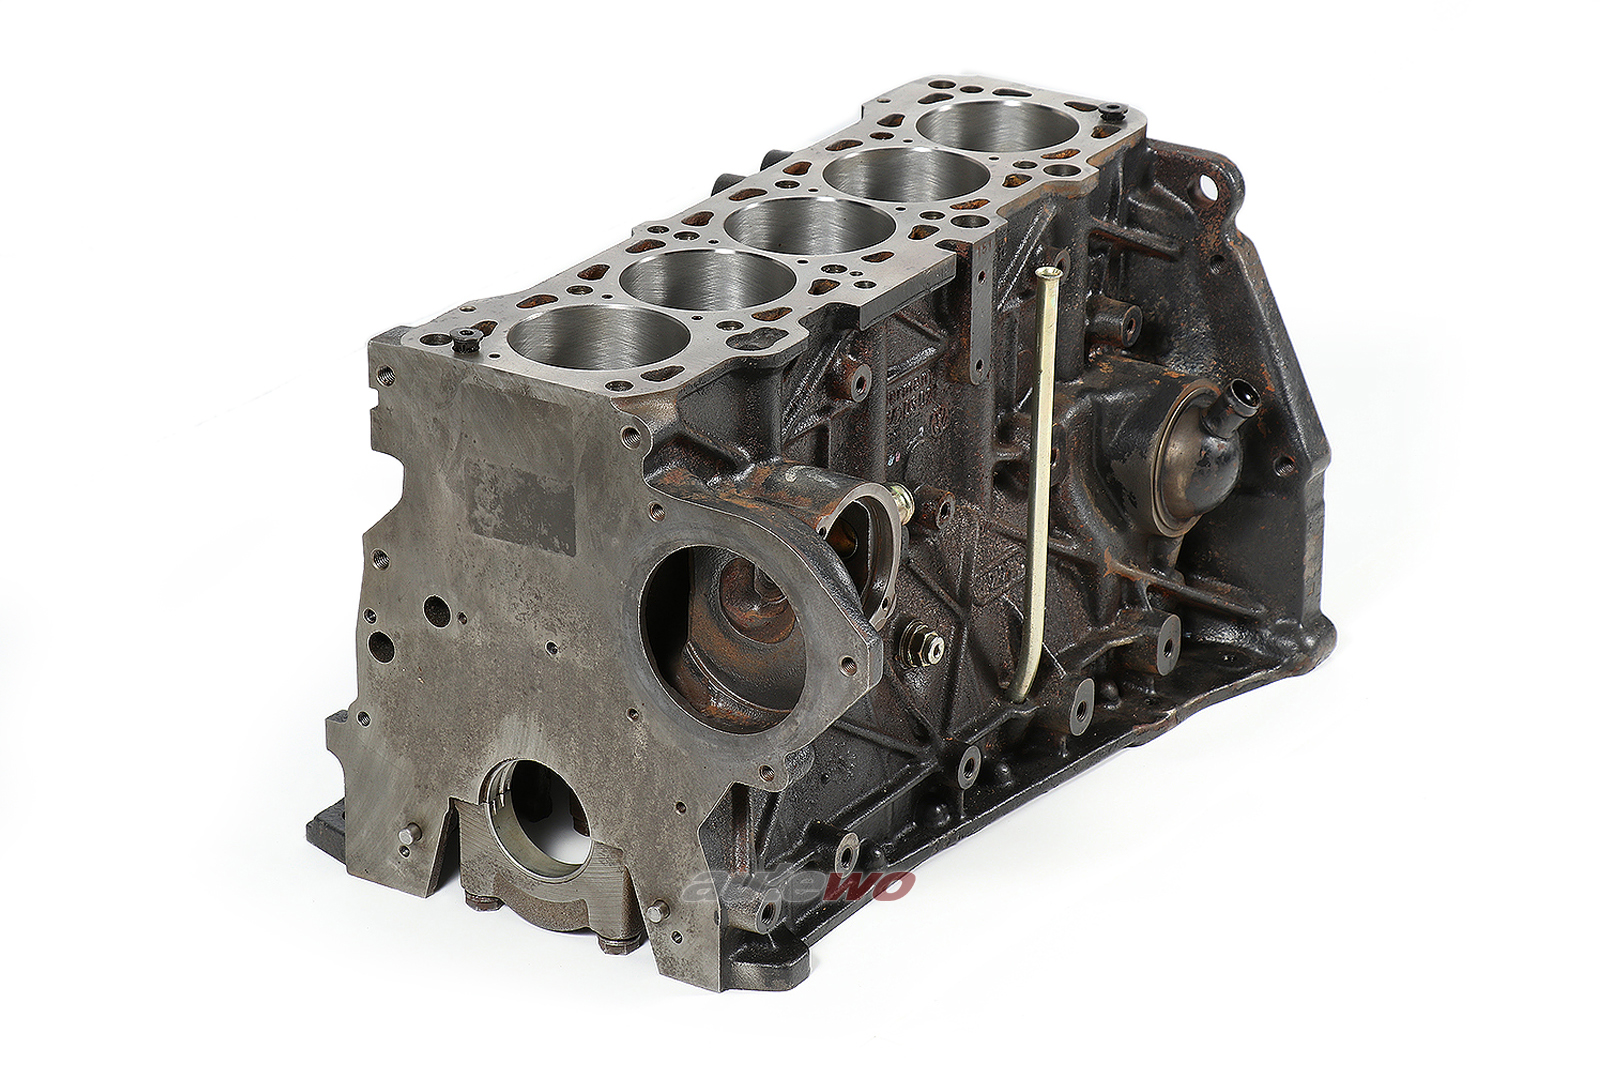 054103021 NEU Audi 90/Coupe Typ 81/85 5 Zylinder Motorblock 81,5mm